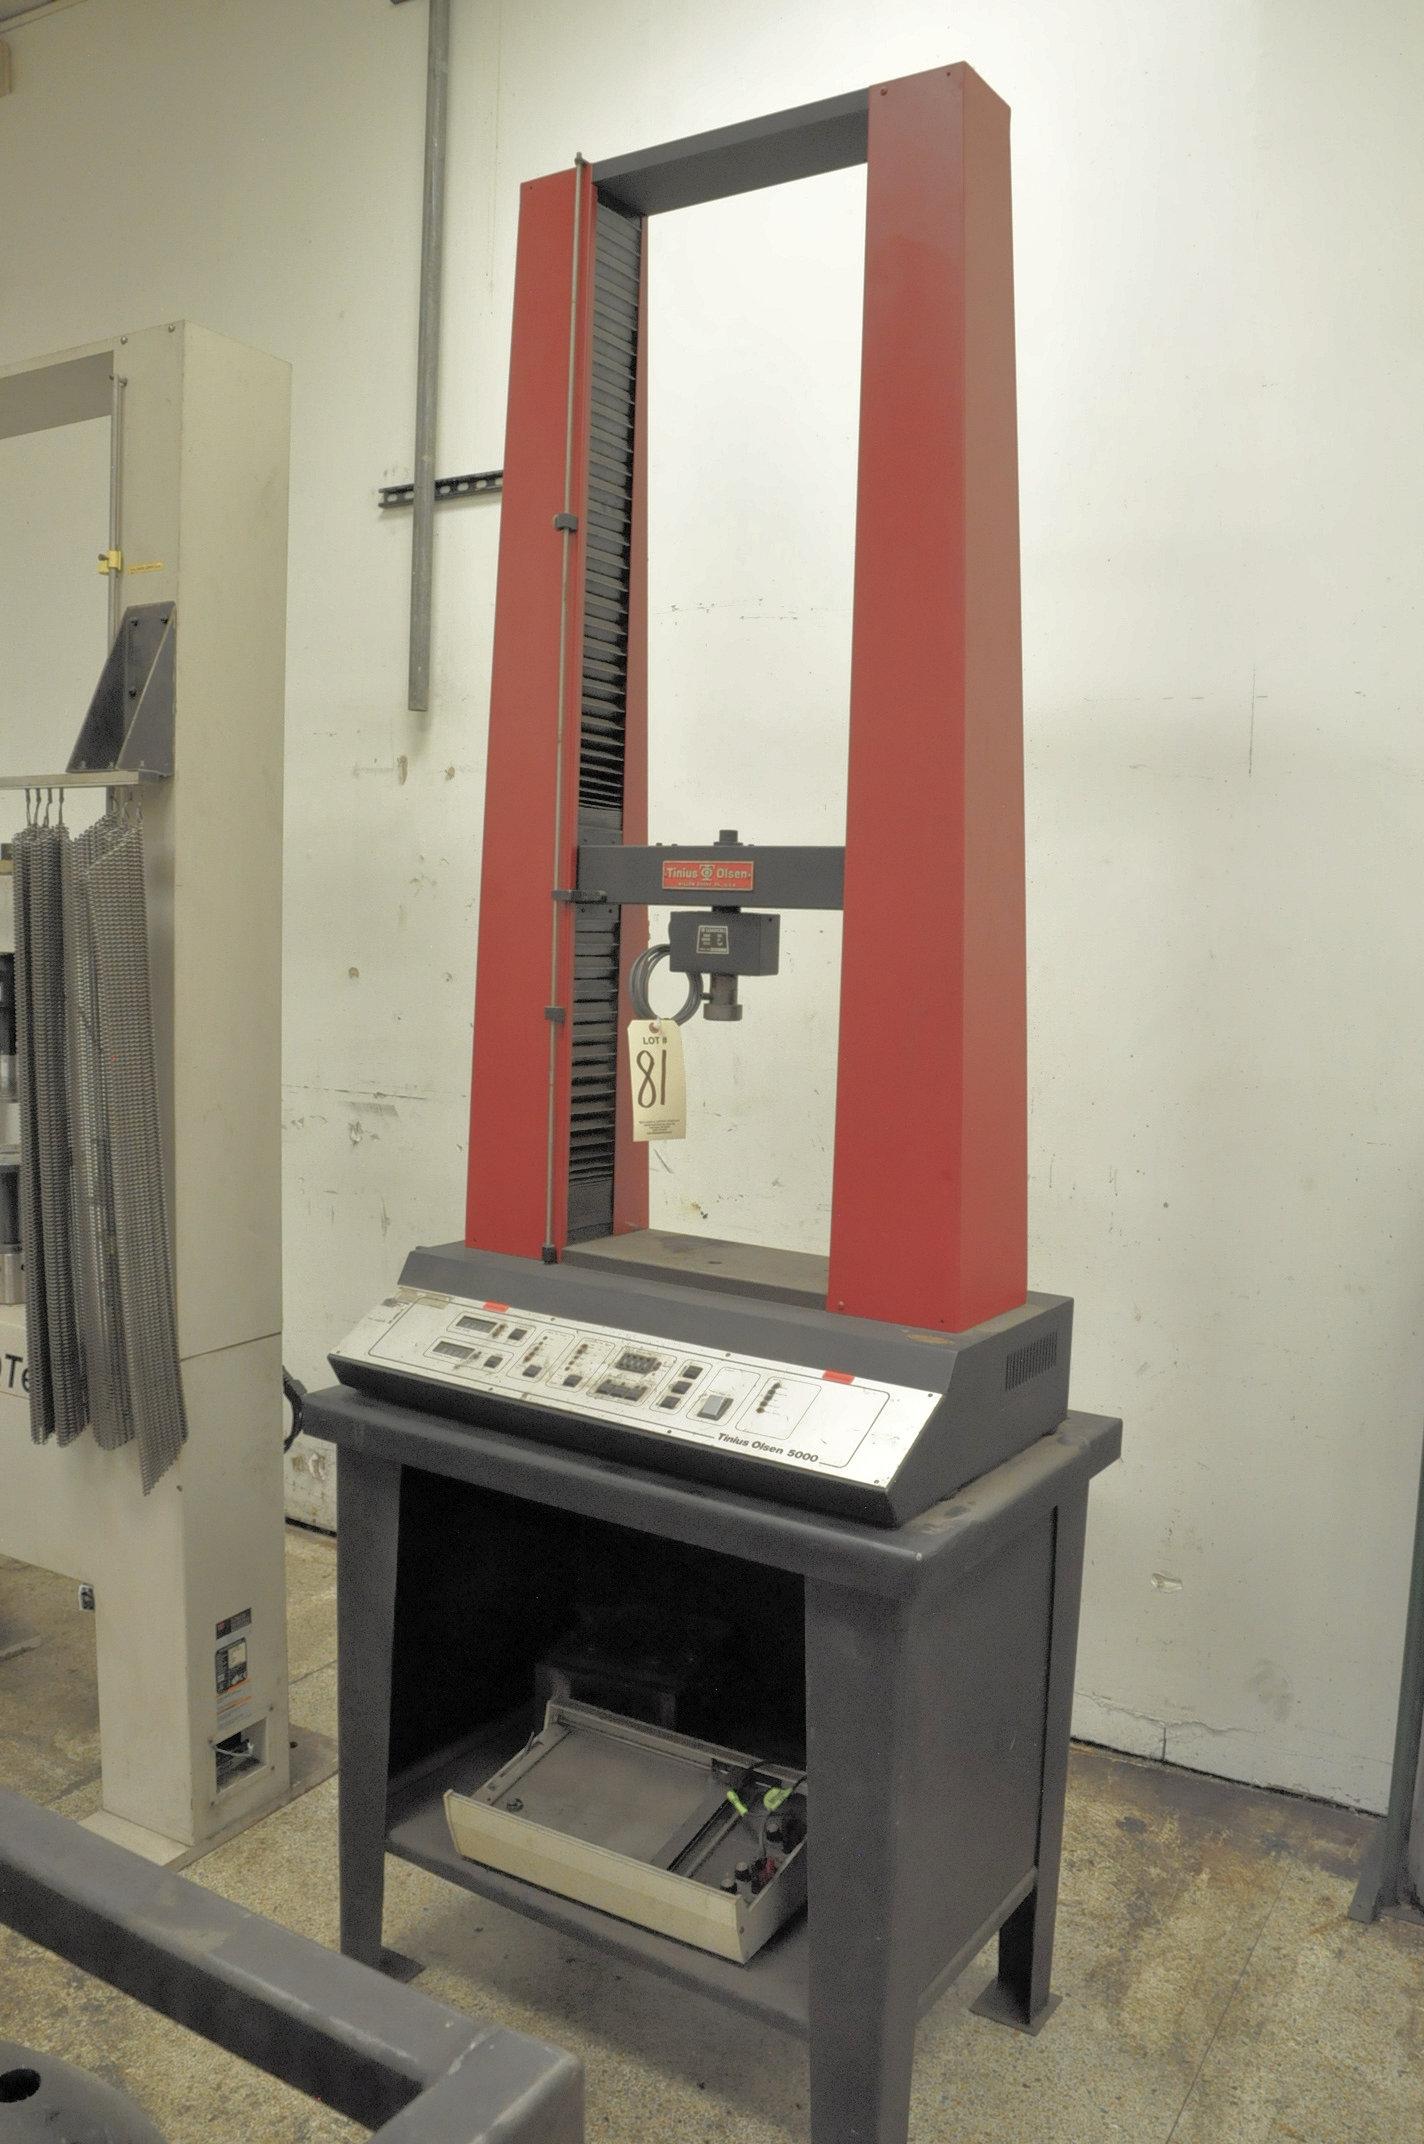 Lot 81 - Tinius Olsen 5000, Vertical Tensile Tester, S/n 154278